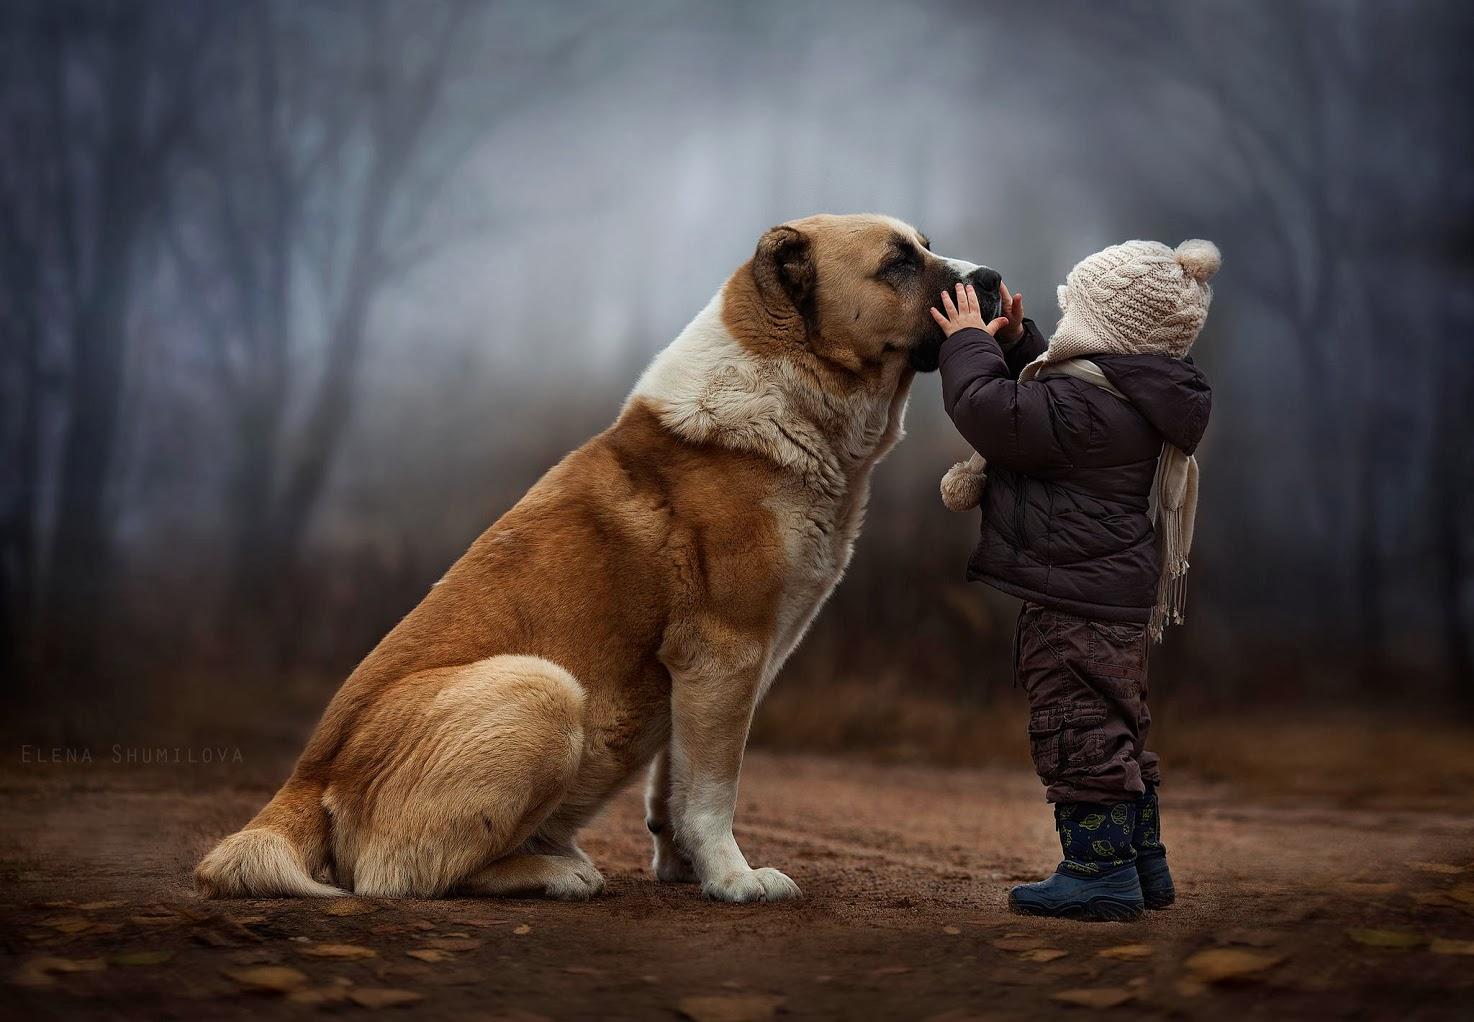 Elena Shumilova Photography #dog #child #animallovers #ambiance